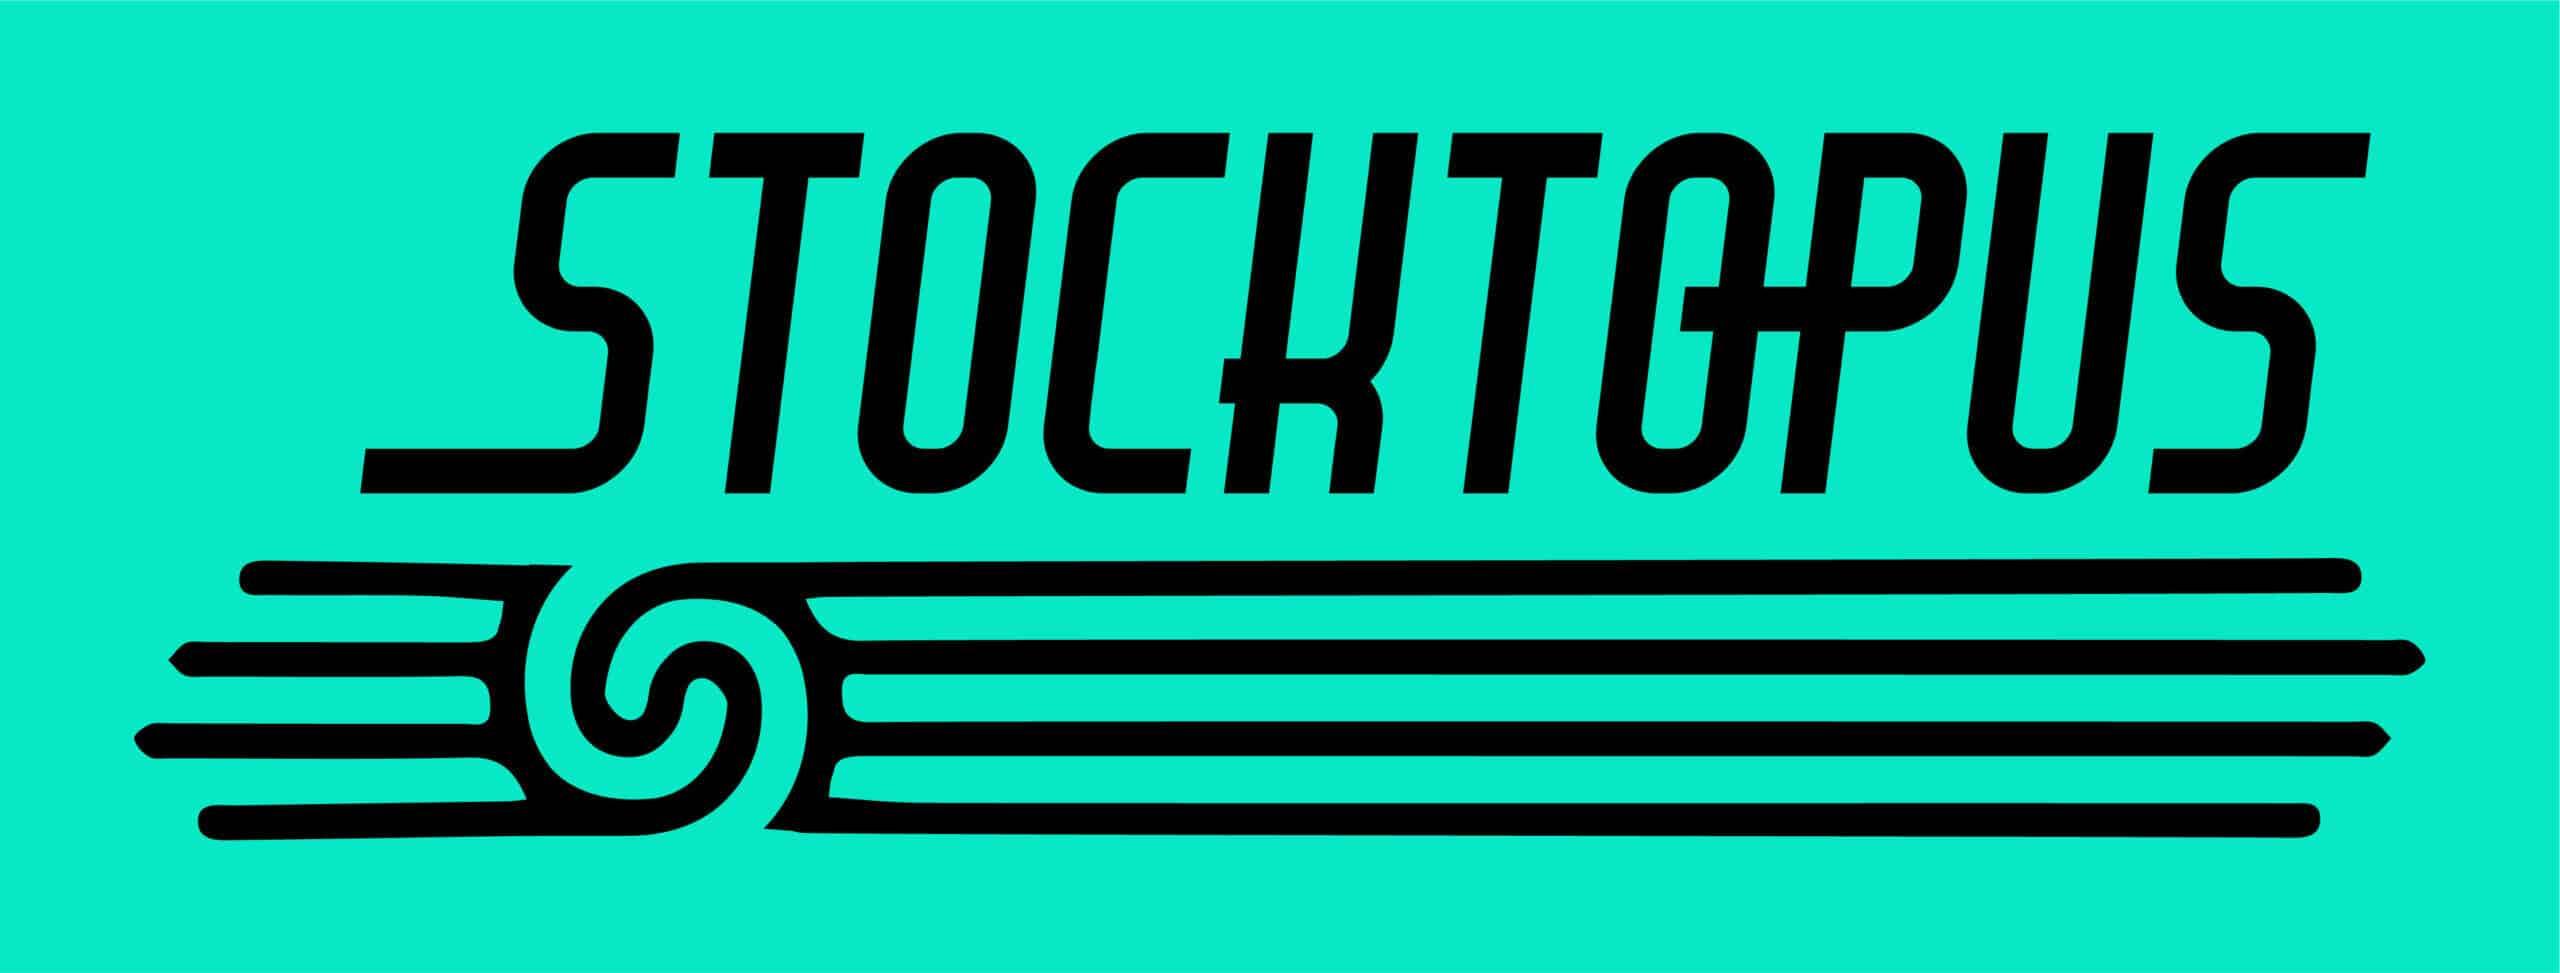 STOCKTOPUS